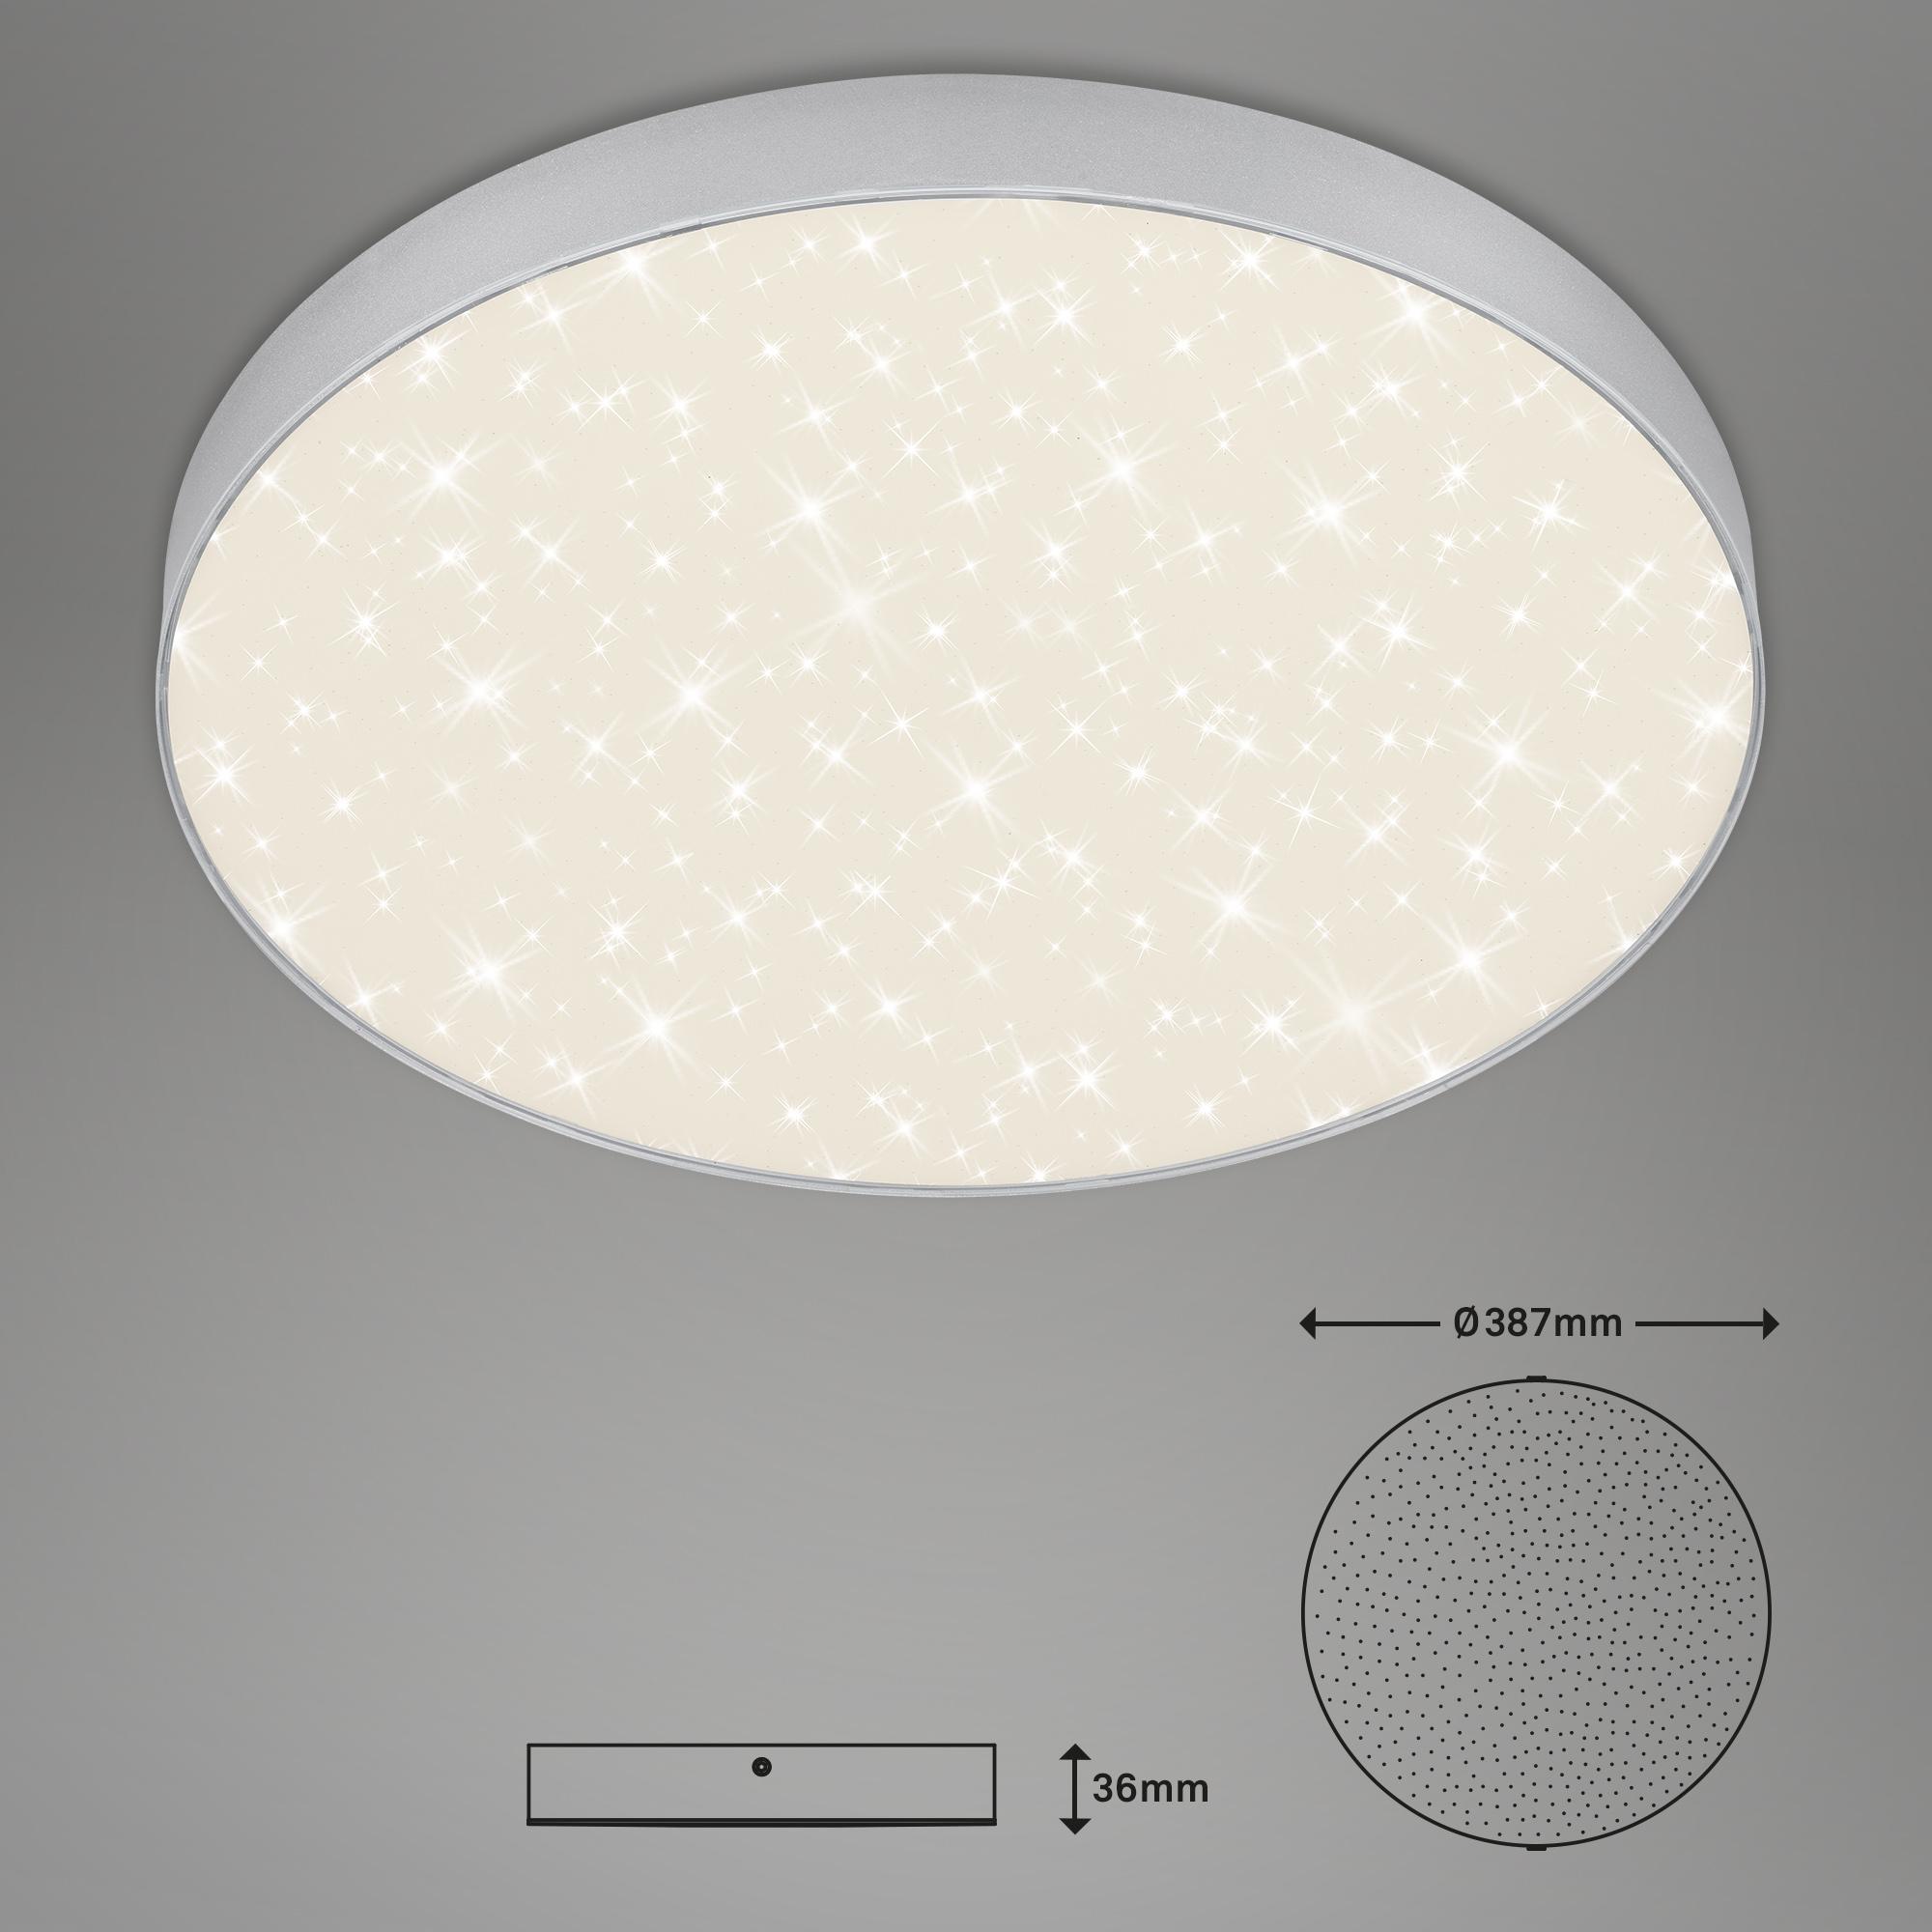 STERNENHIMMEL LED Deckenleuchte, Ø 38,7 cm, 24,5 W, Silber